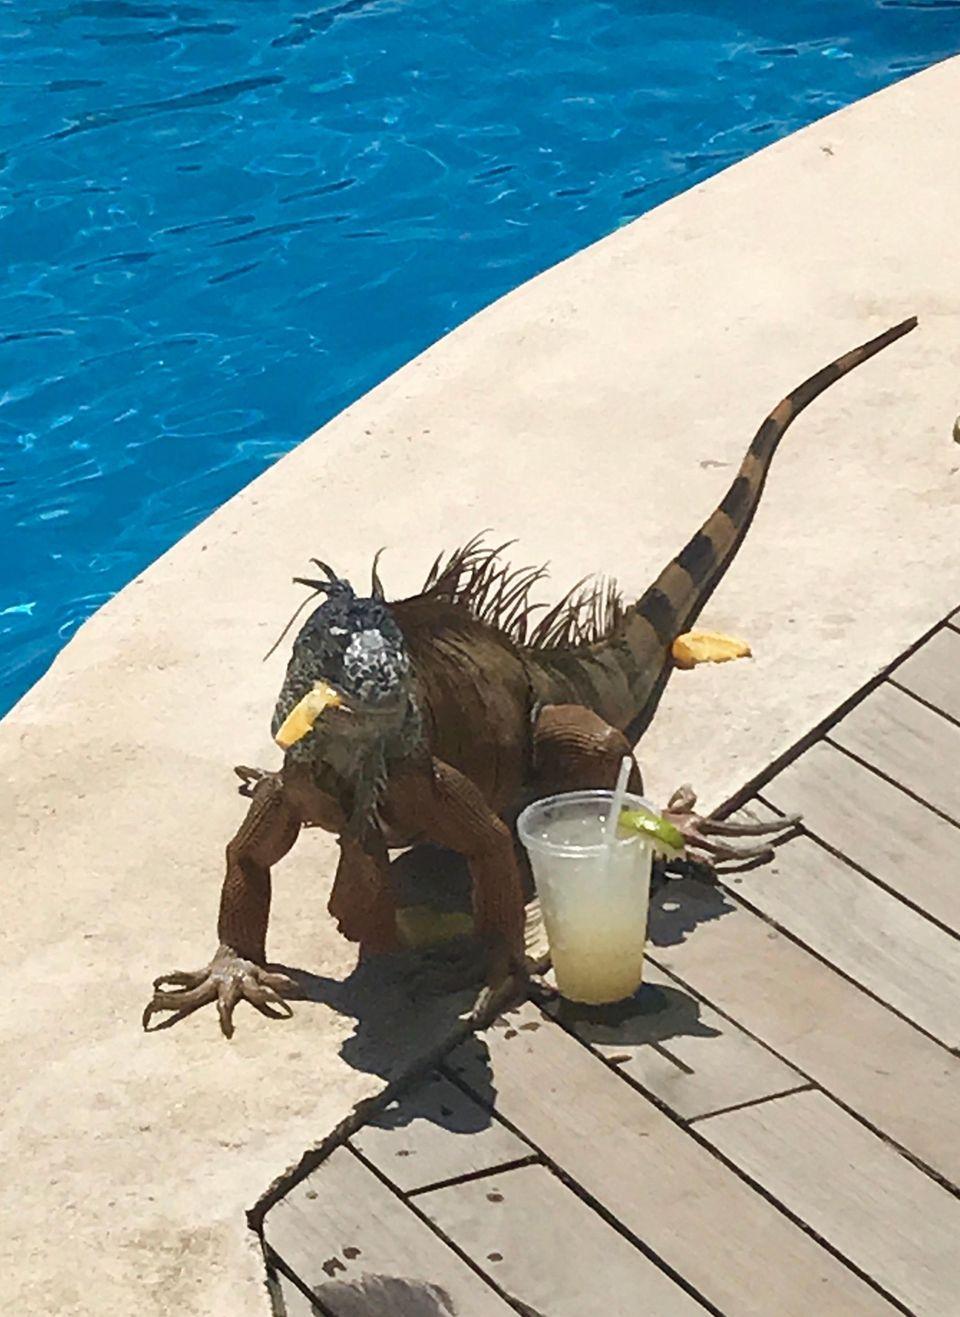 Mr. Iguana during Happy Hour at Vidanta Resort